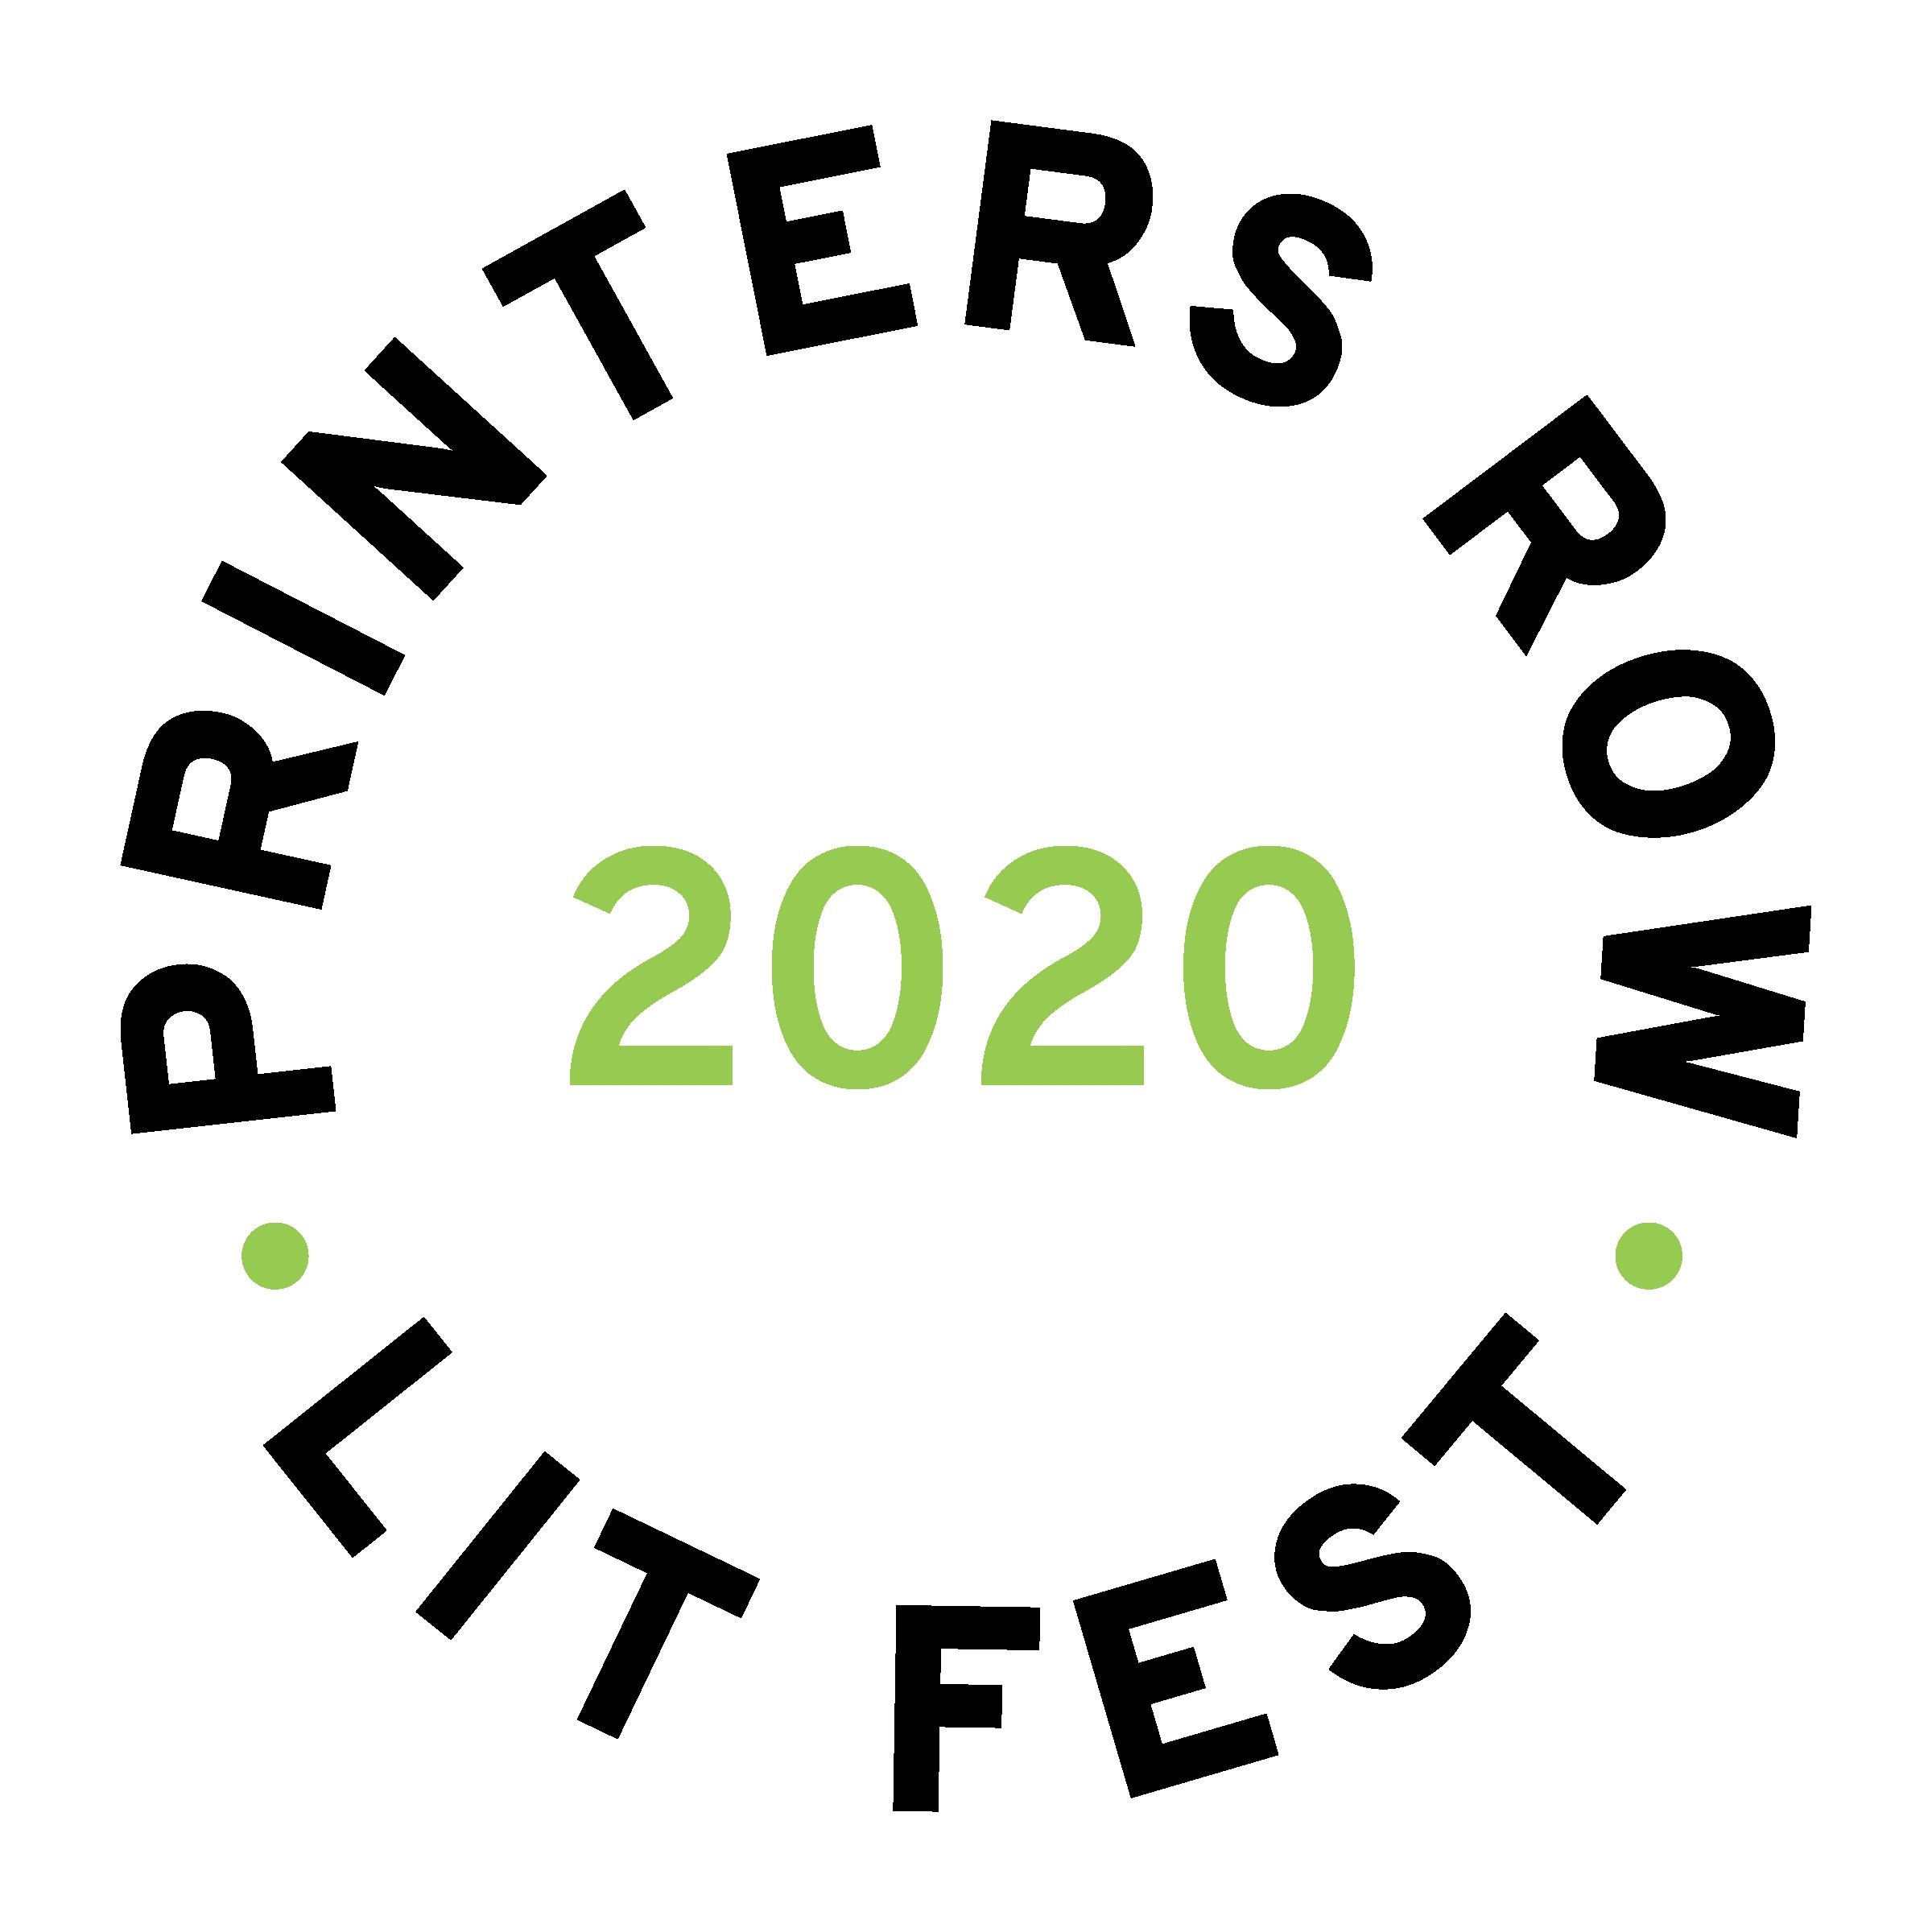 PrintersRowLitFest_logo2020